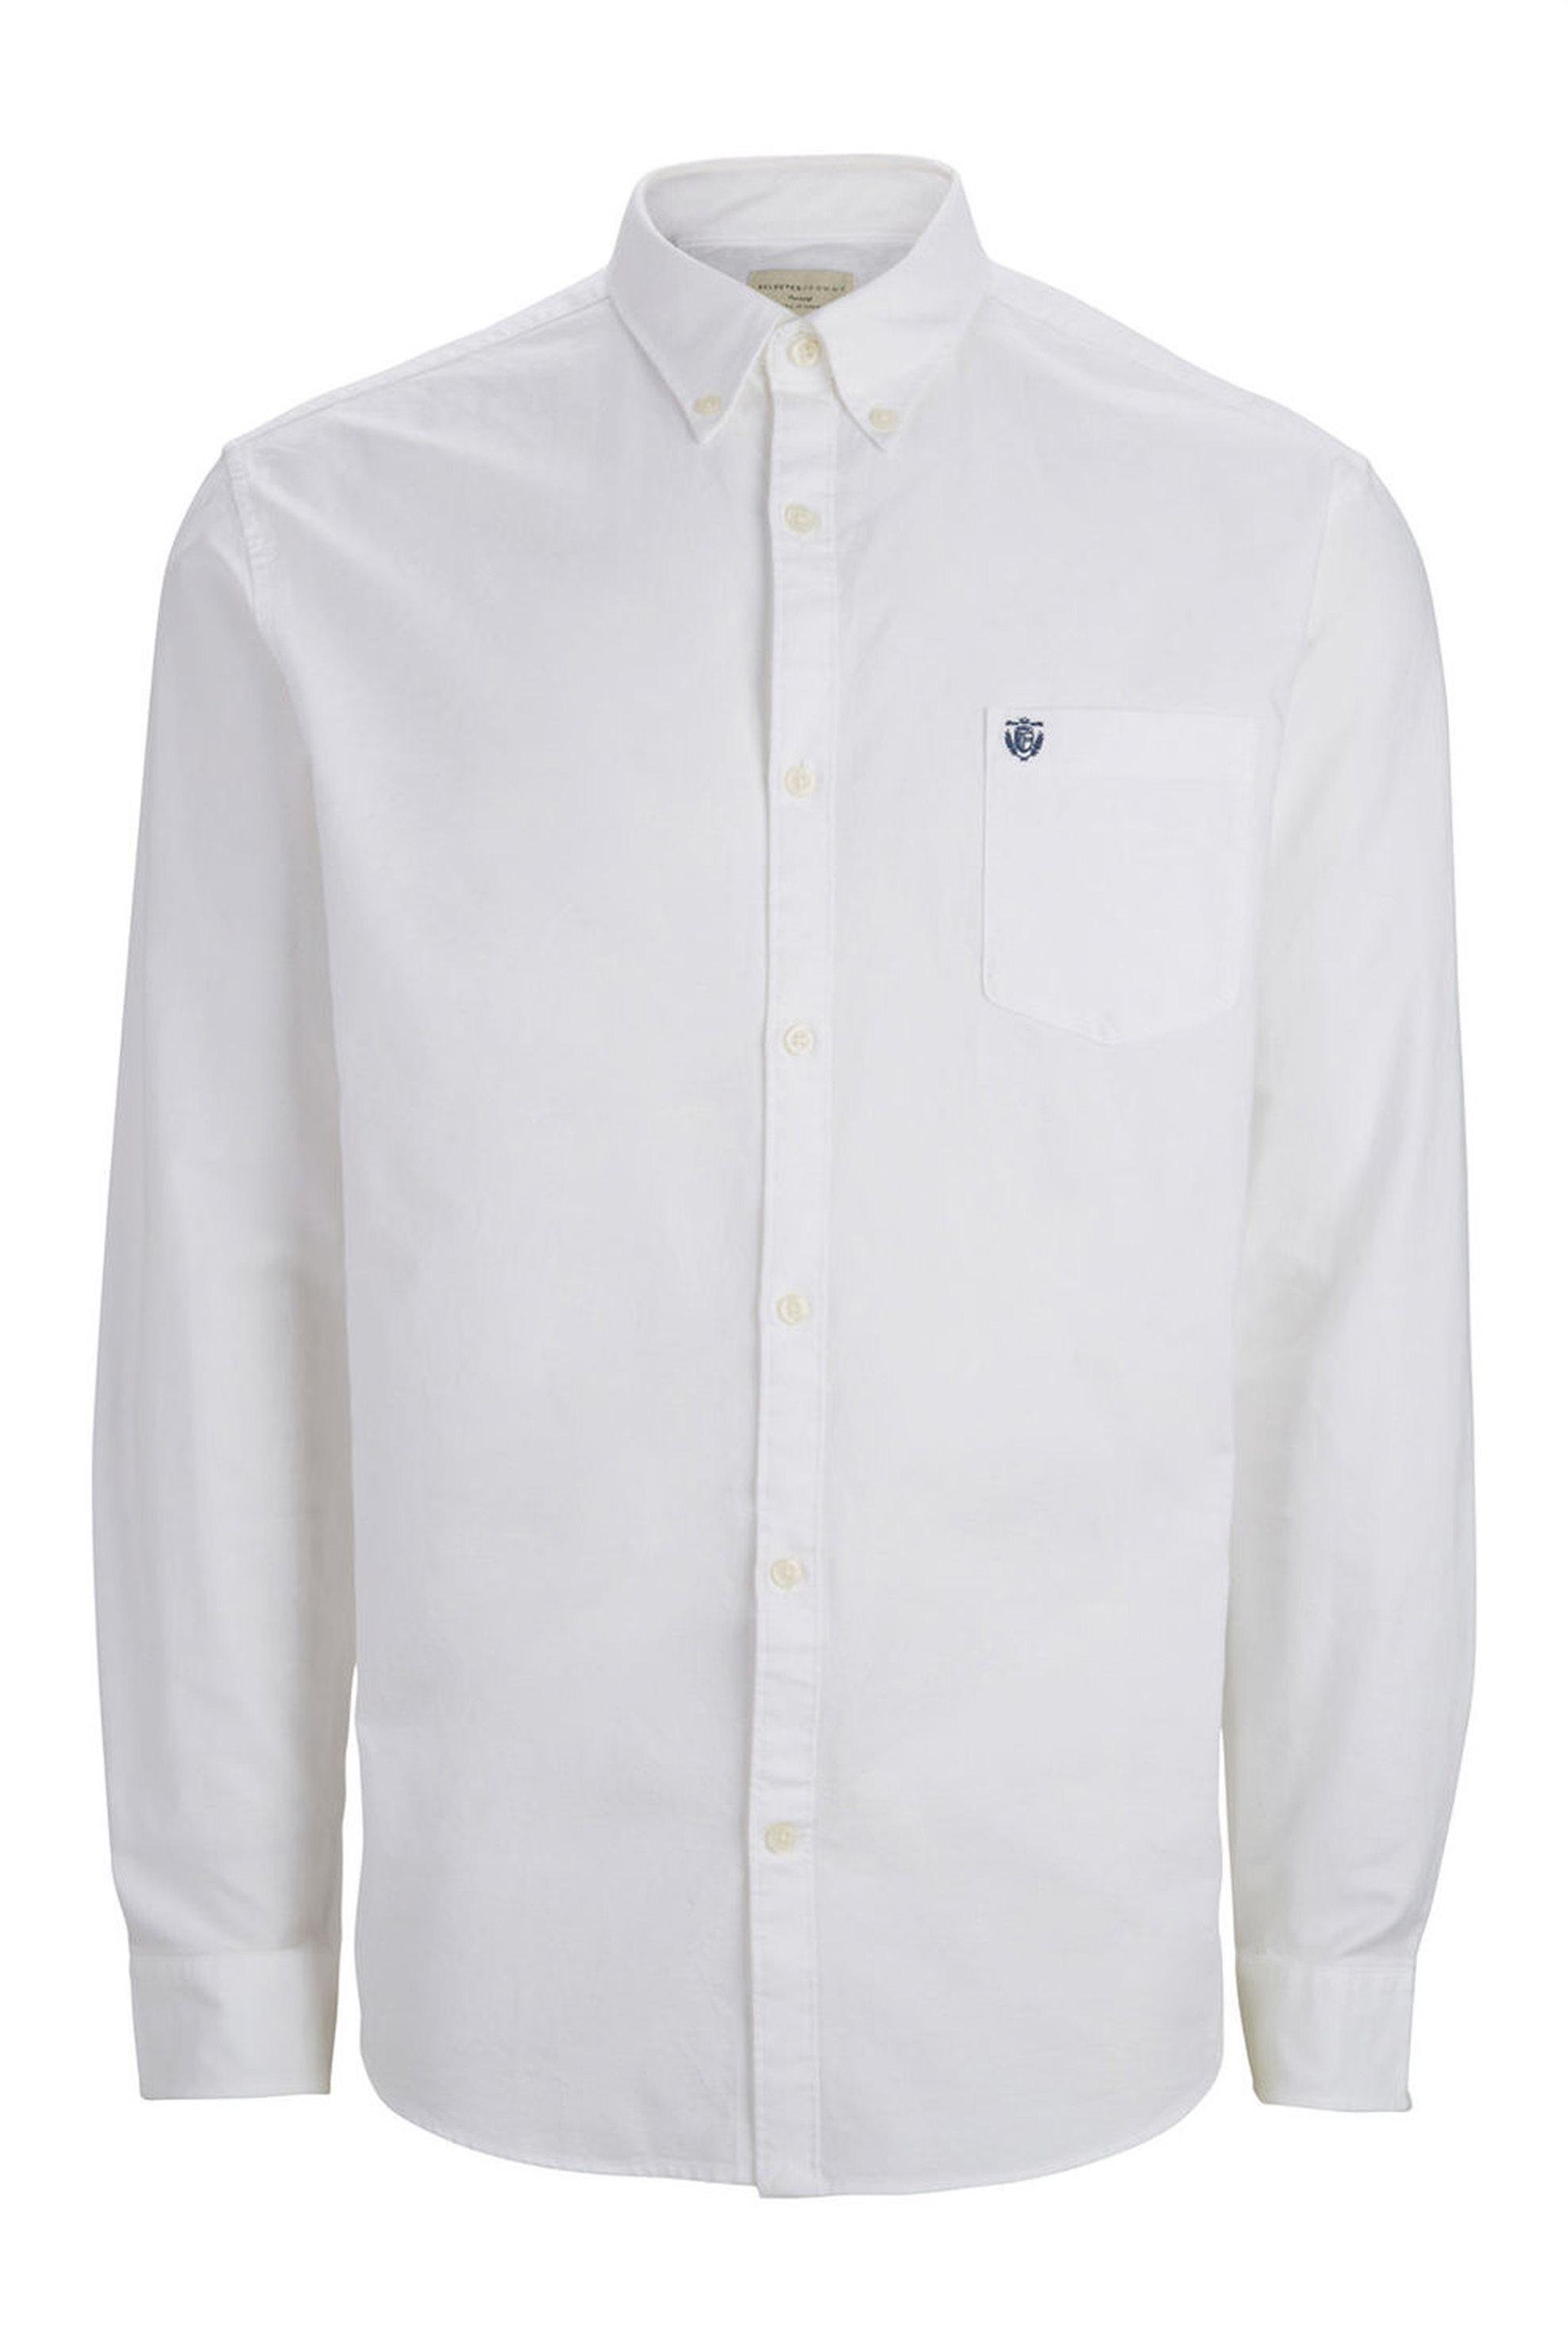 ab133b855933 SELECTED ανδρικό πουκάμισο Oxford - 16040493 - Λευκό